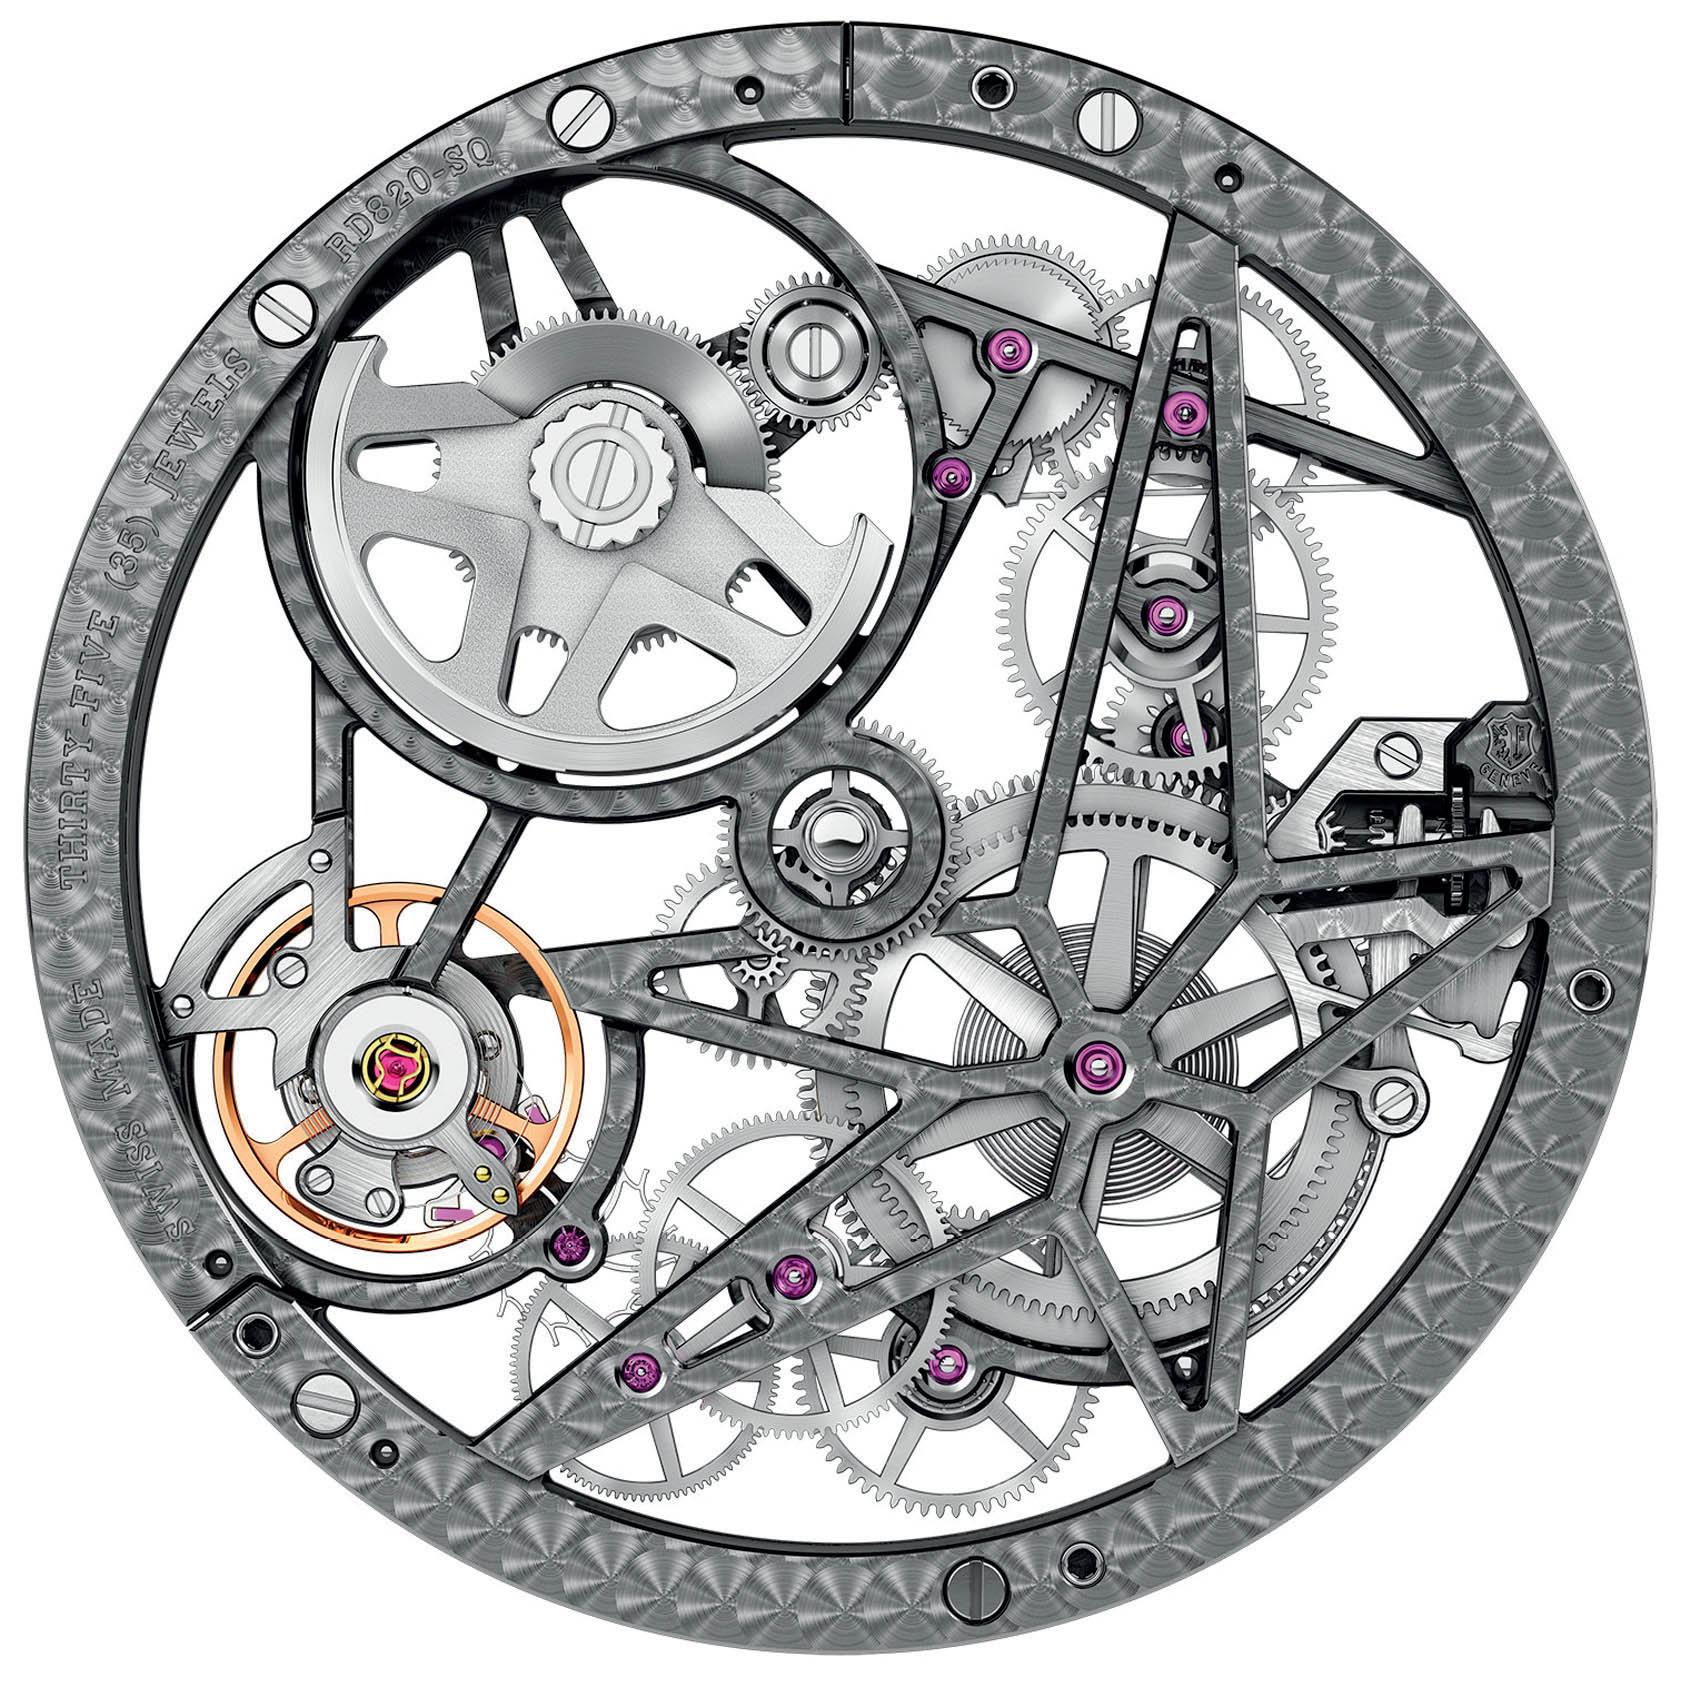 Cỗ máy của đồng hồ Roger Dubuis Excalibur Automatic Skeleton